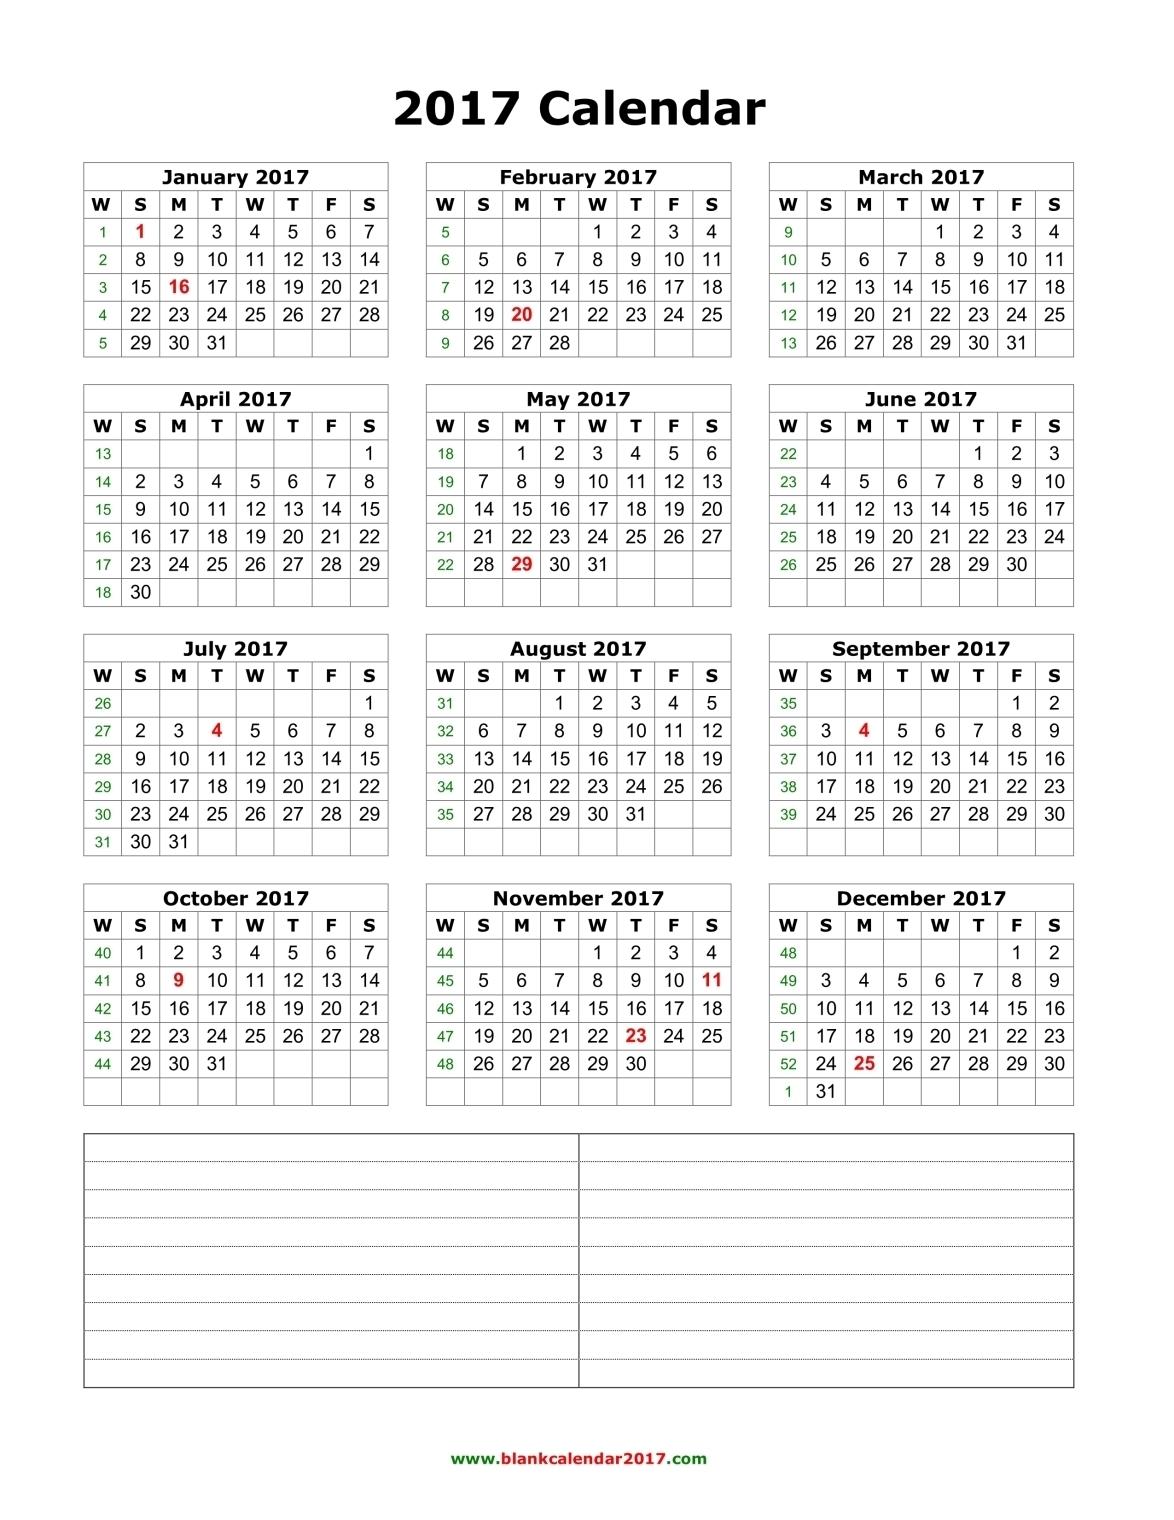 Blank Calendar 20173abry